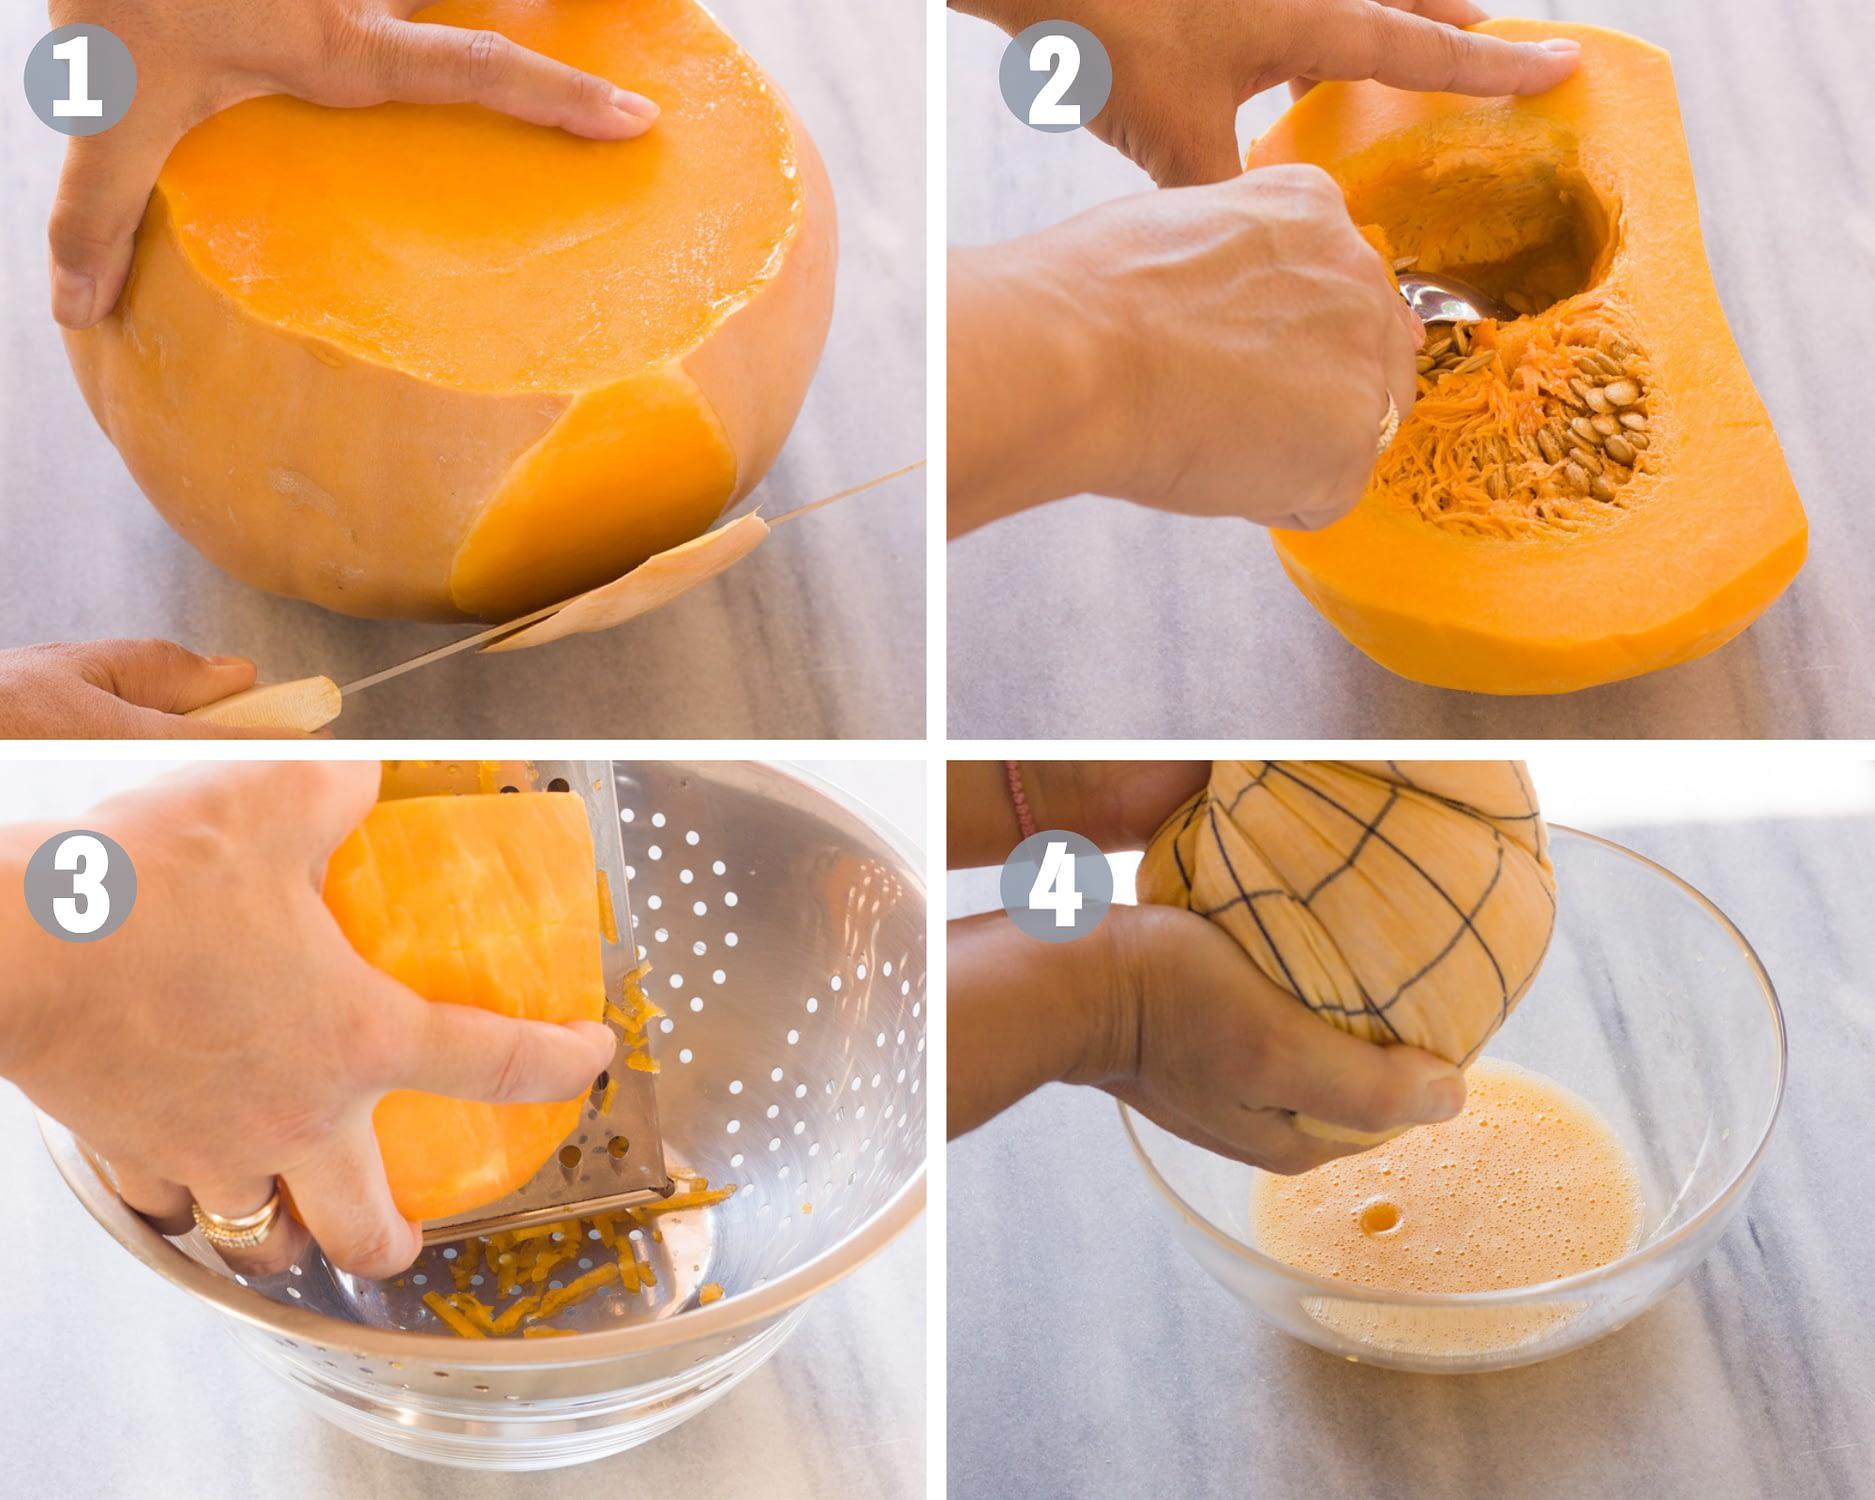 Kolokithopita Greek pumpkin hand pies steps 1-4